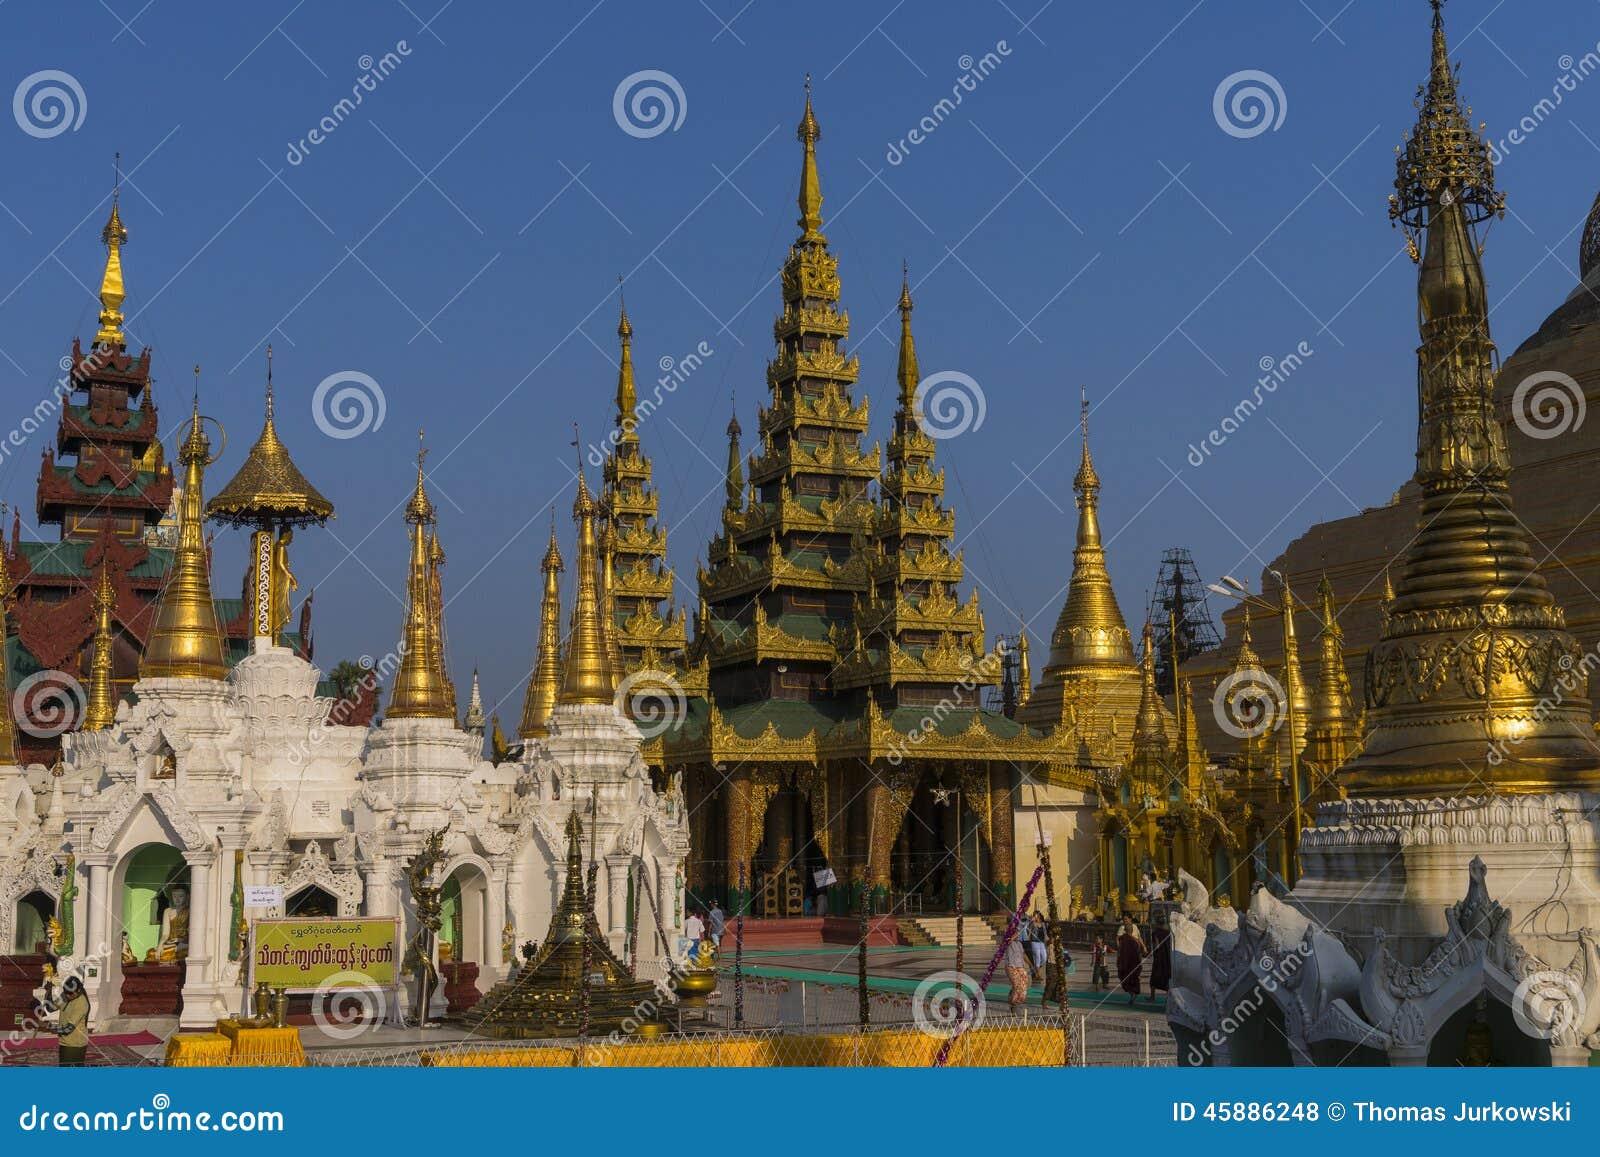 Shwedagon pagoda in yangon editorial stock photo image for Http wikipedia org wiki